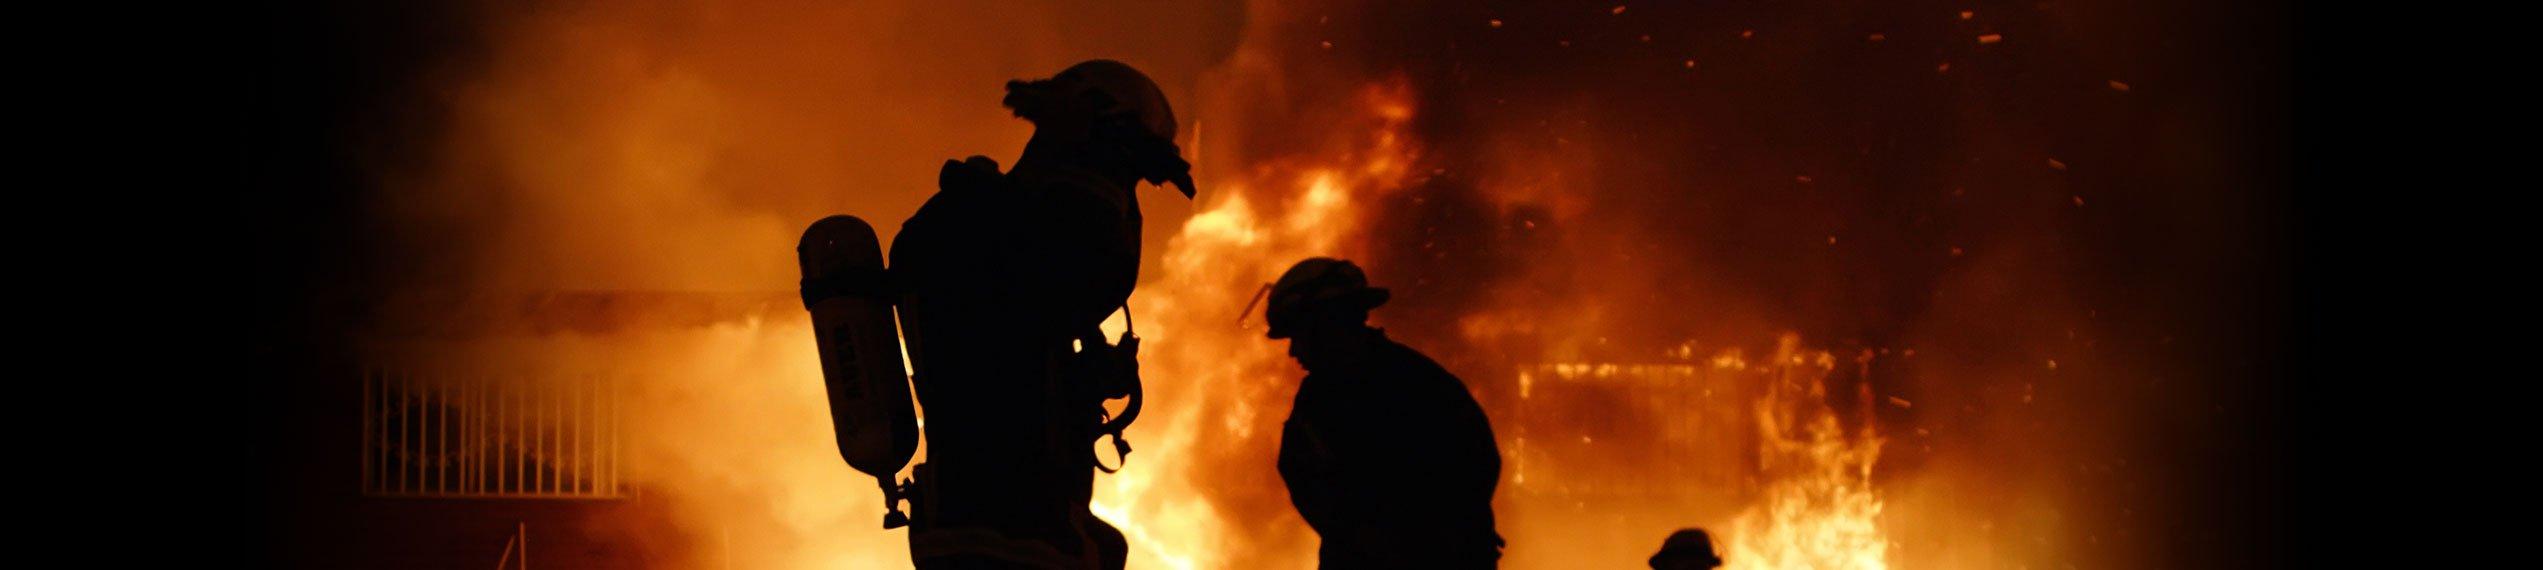 Fire & Smoke Damage Removal in Paul Davis Restoration & Remodeling of Rock Hill